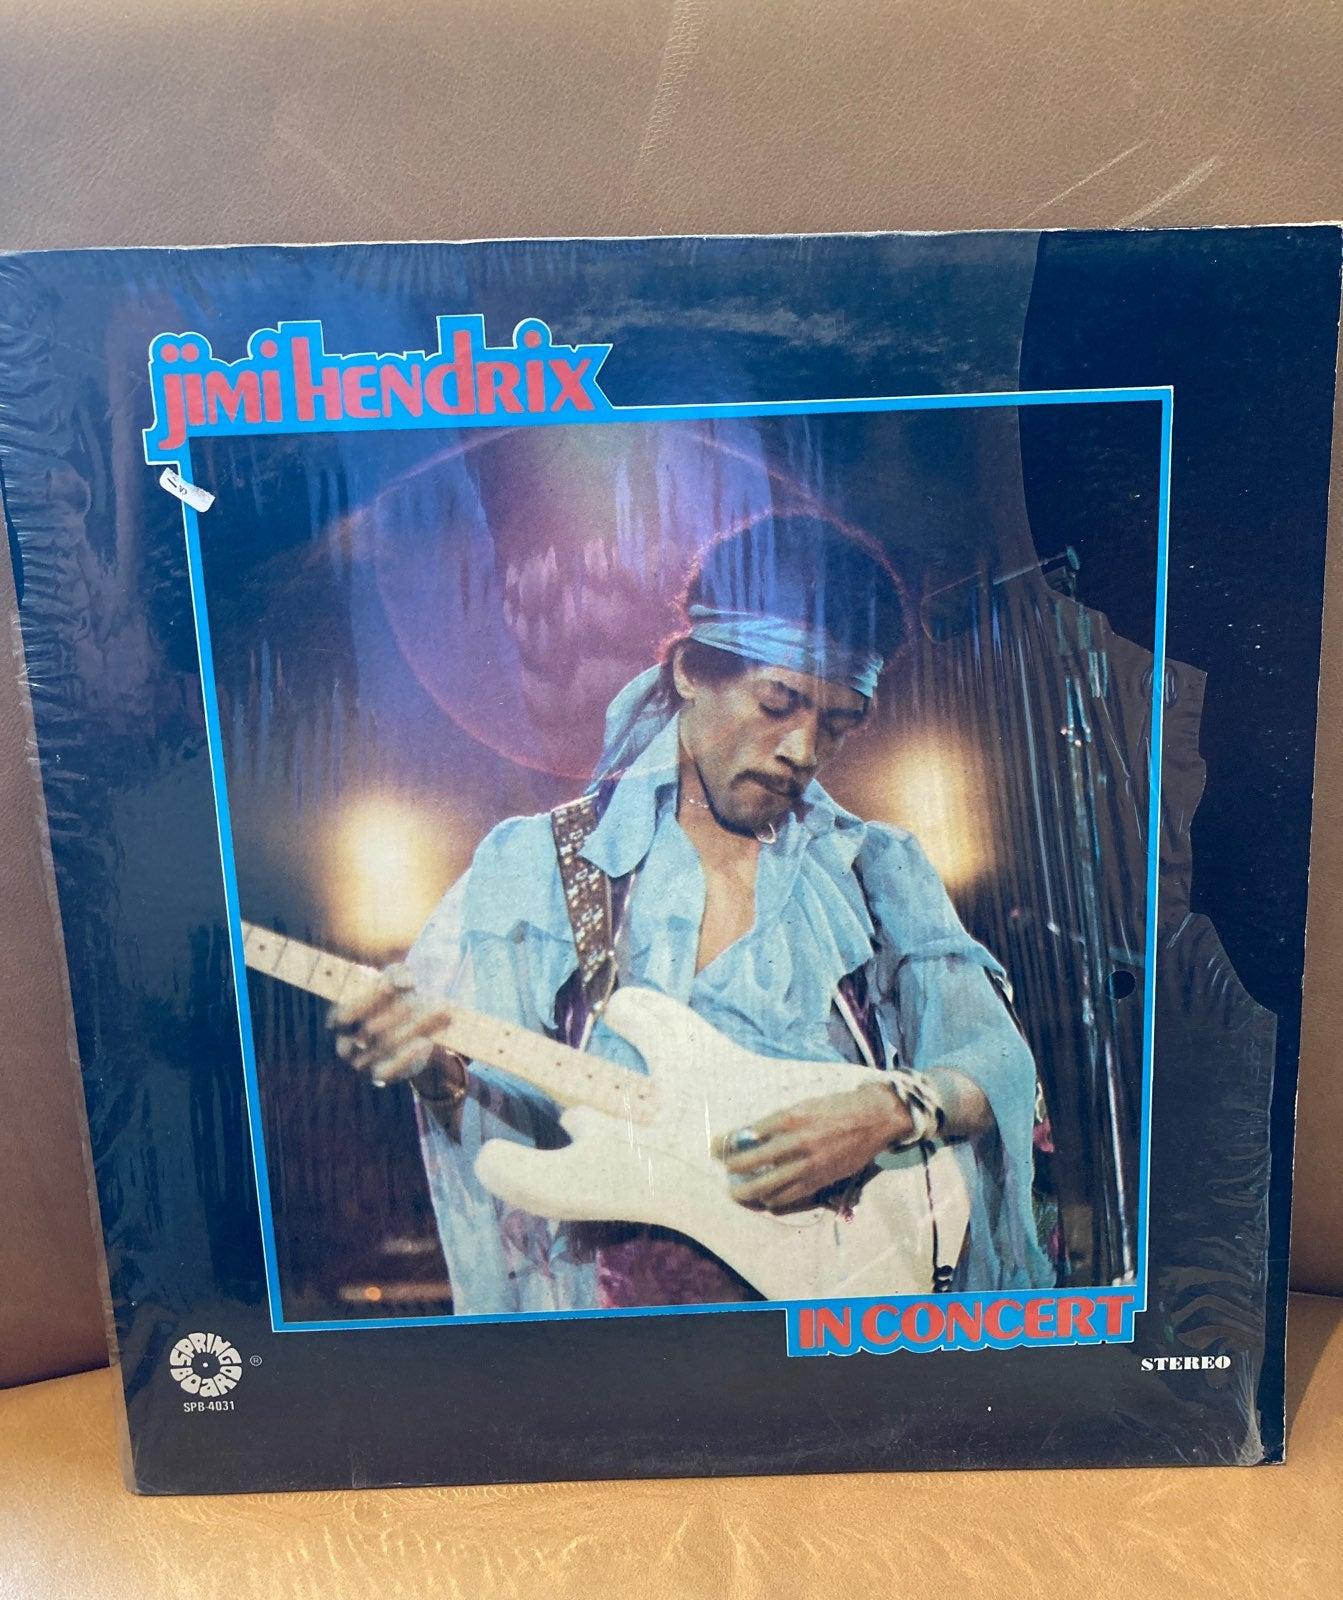 Jimi Hendrix Live in Concert (Vinyl)